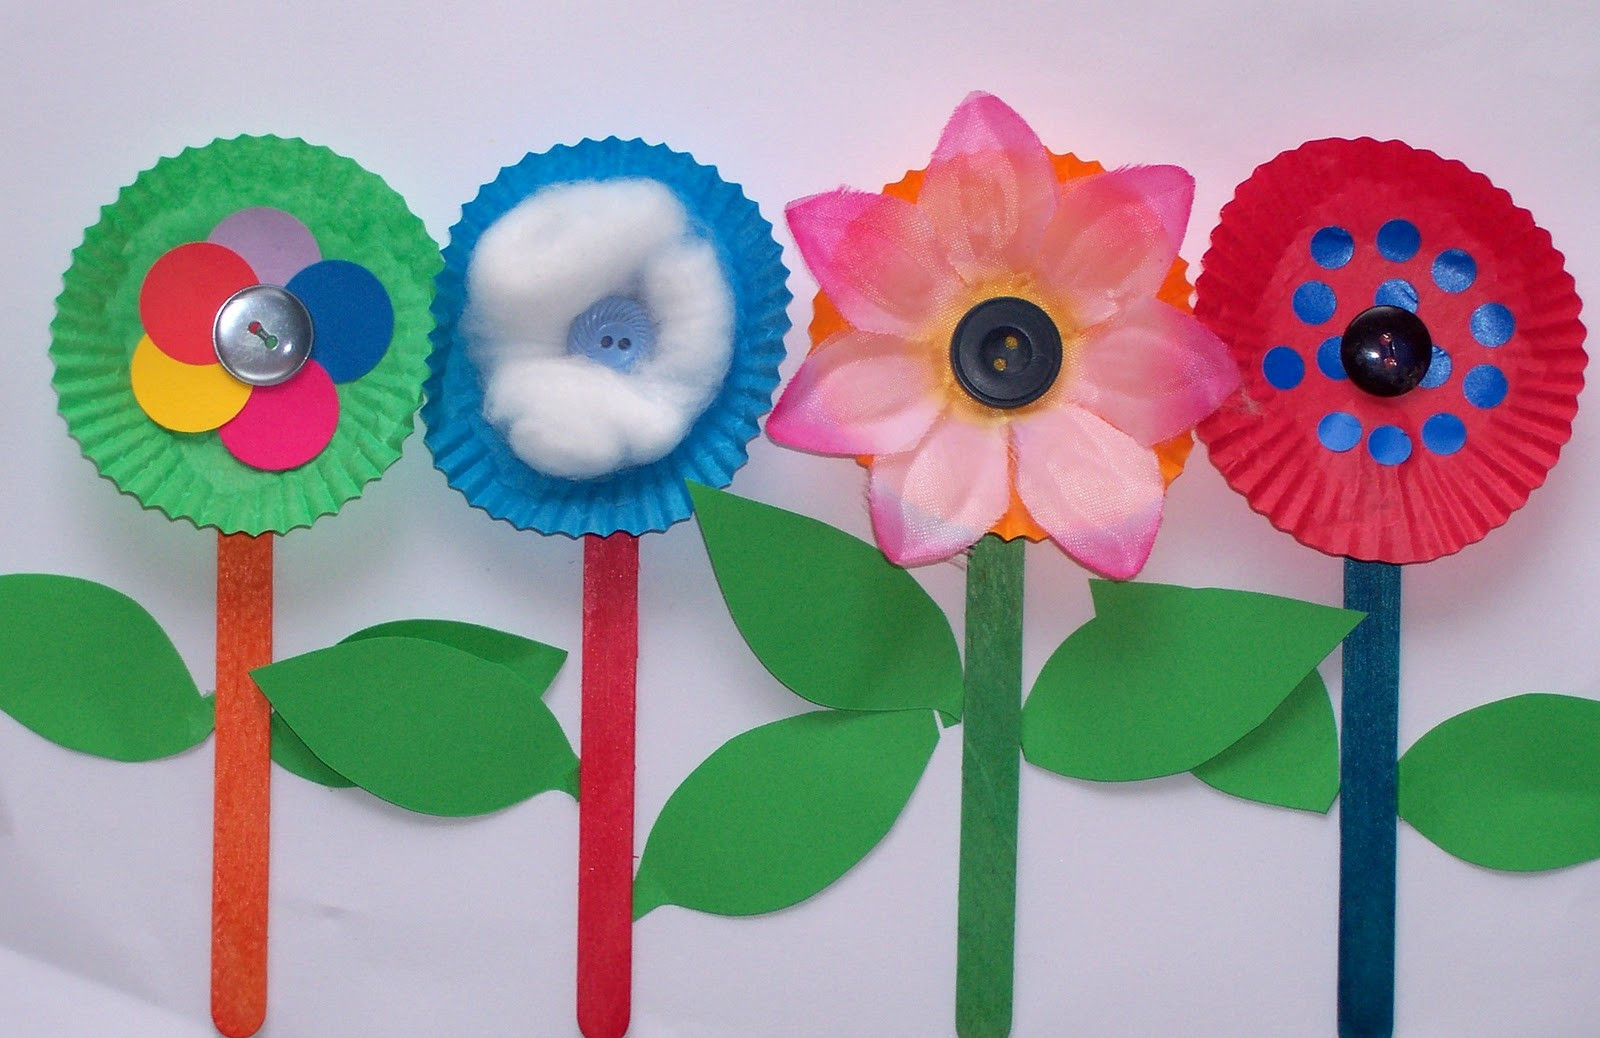 Preschool Arts Crafts  Bryan Lie Art Printable Crafts for Kids